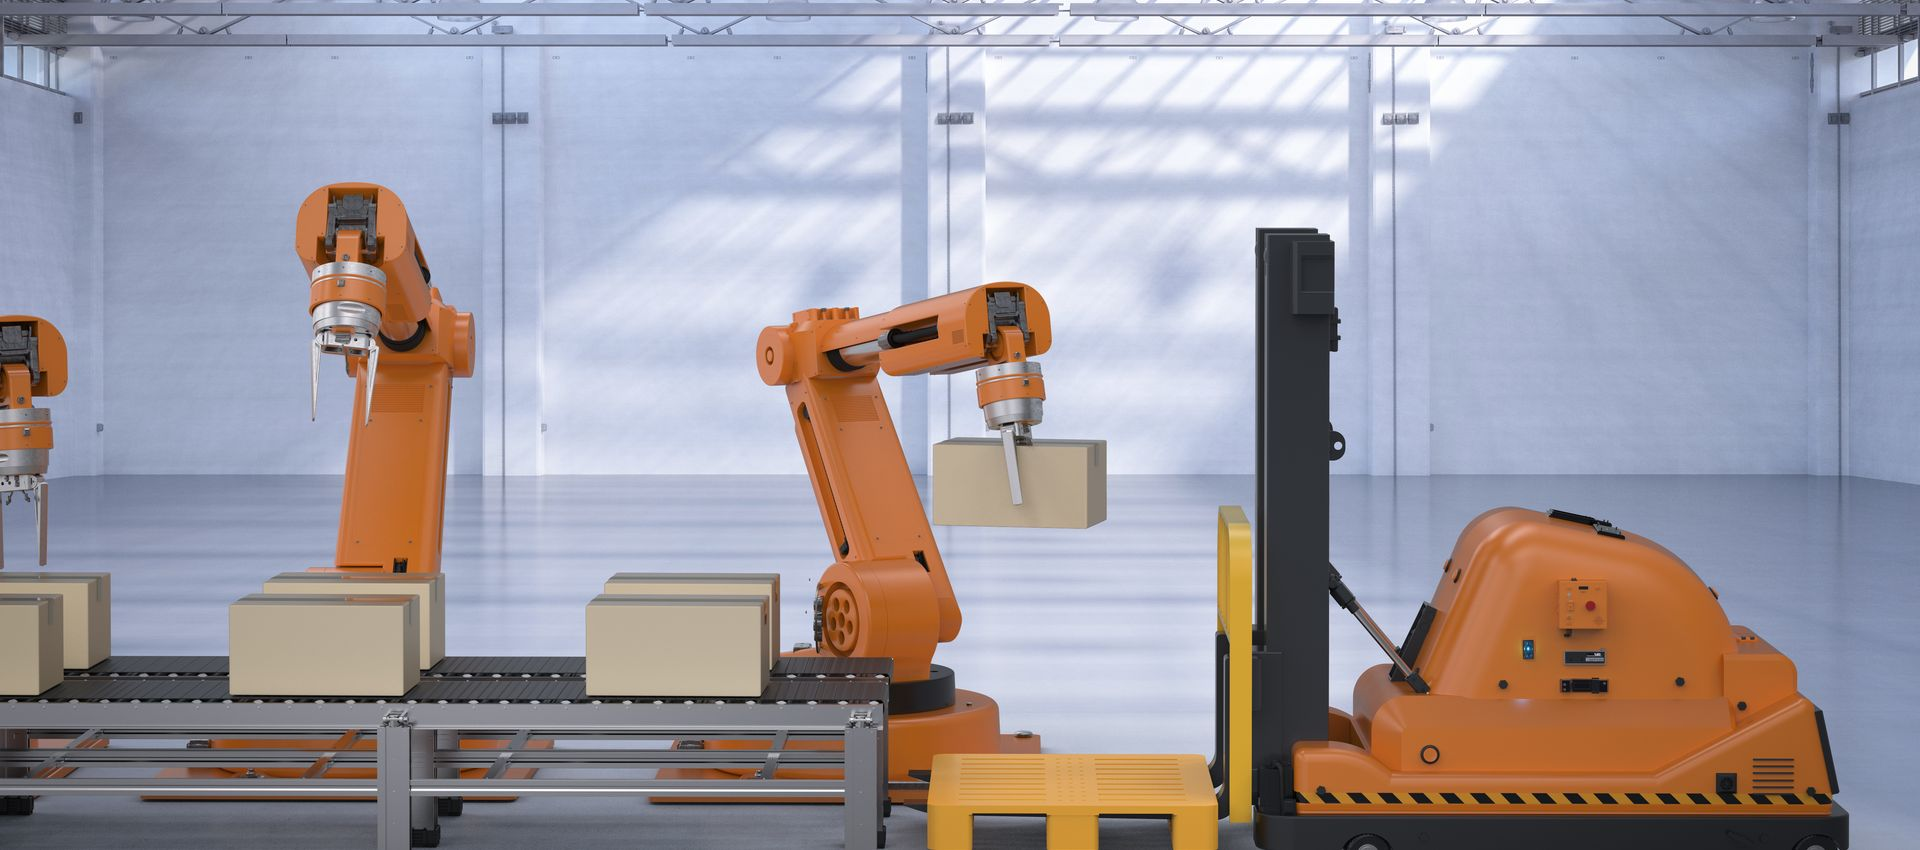 Warehouse Technology: Robotics and Automation